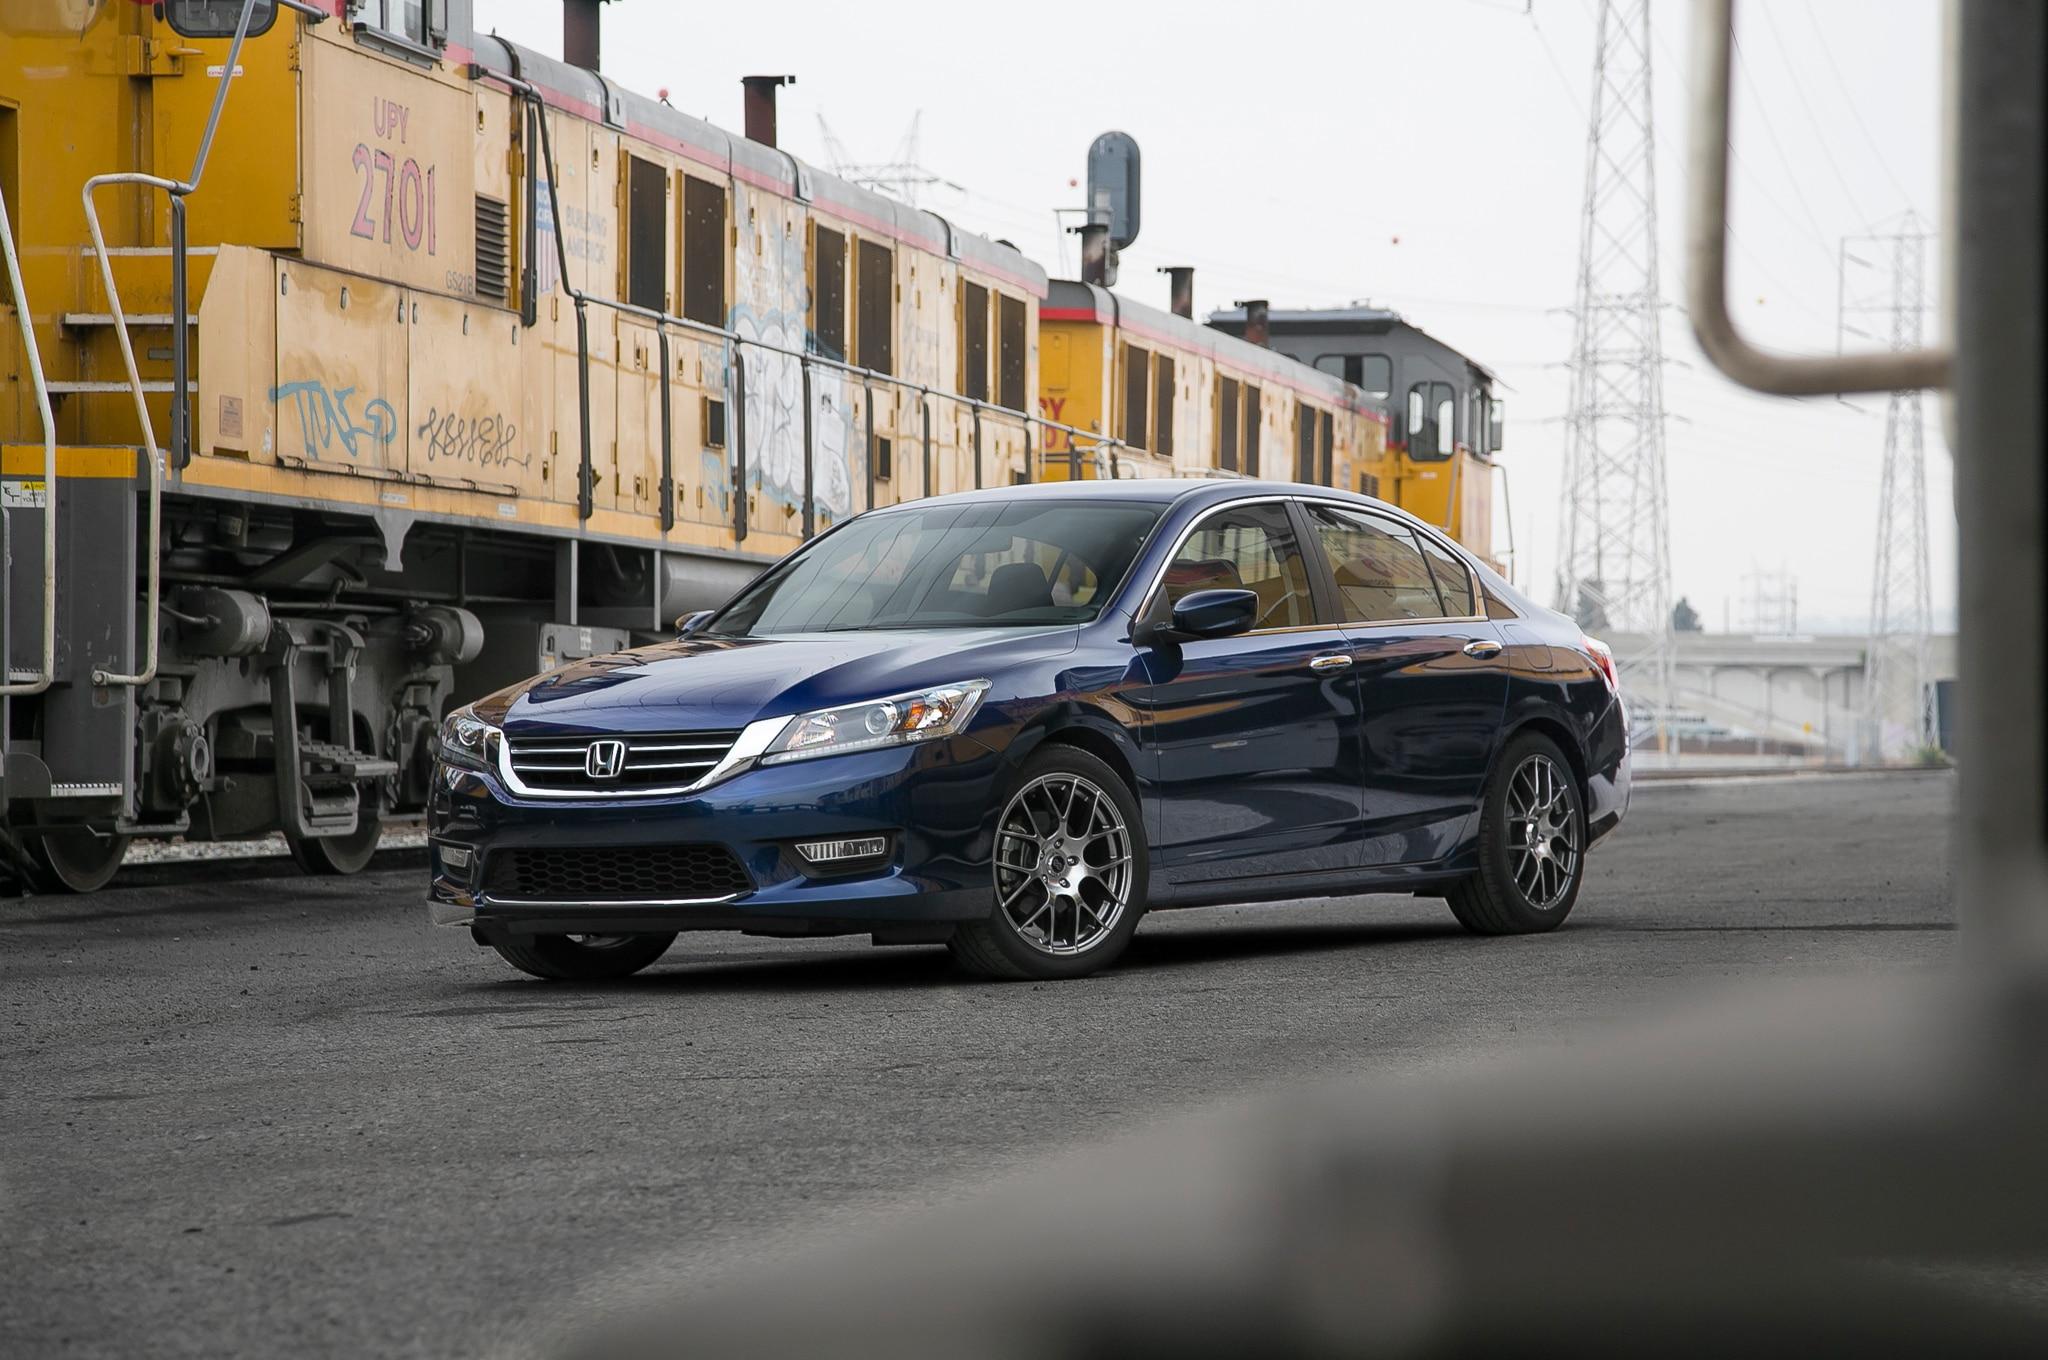 honda shows 2013 accord hfp coupe alongside 401 hp bisimoto coupe at sema show. Black Bedroom Furniture Sets. Home Design Ideas